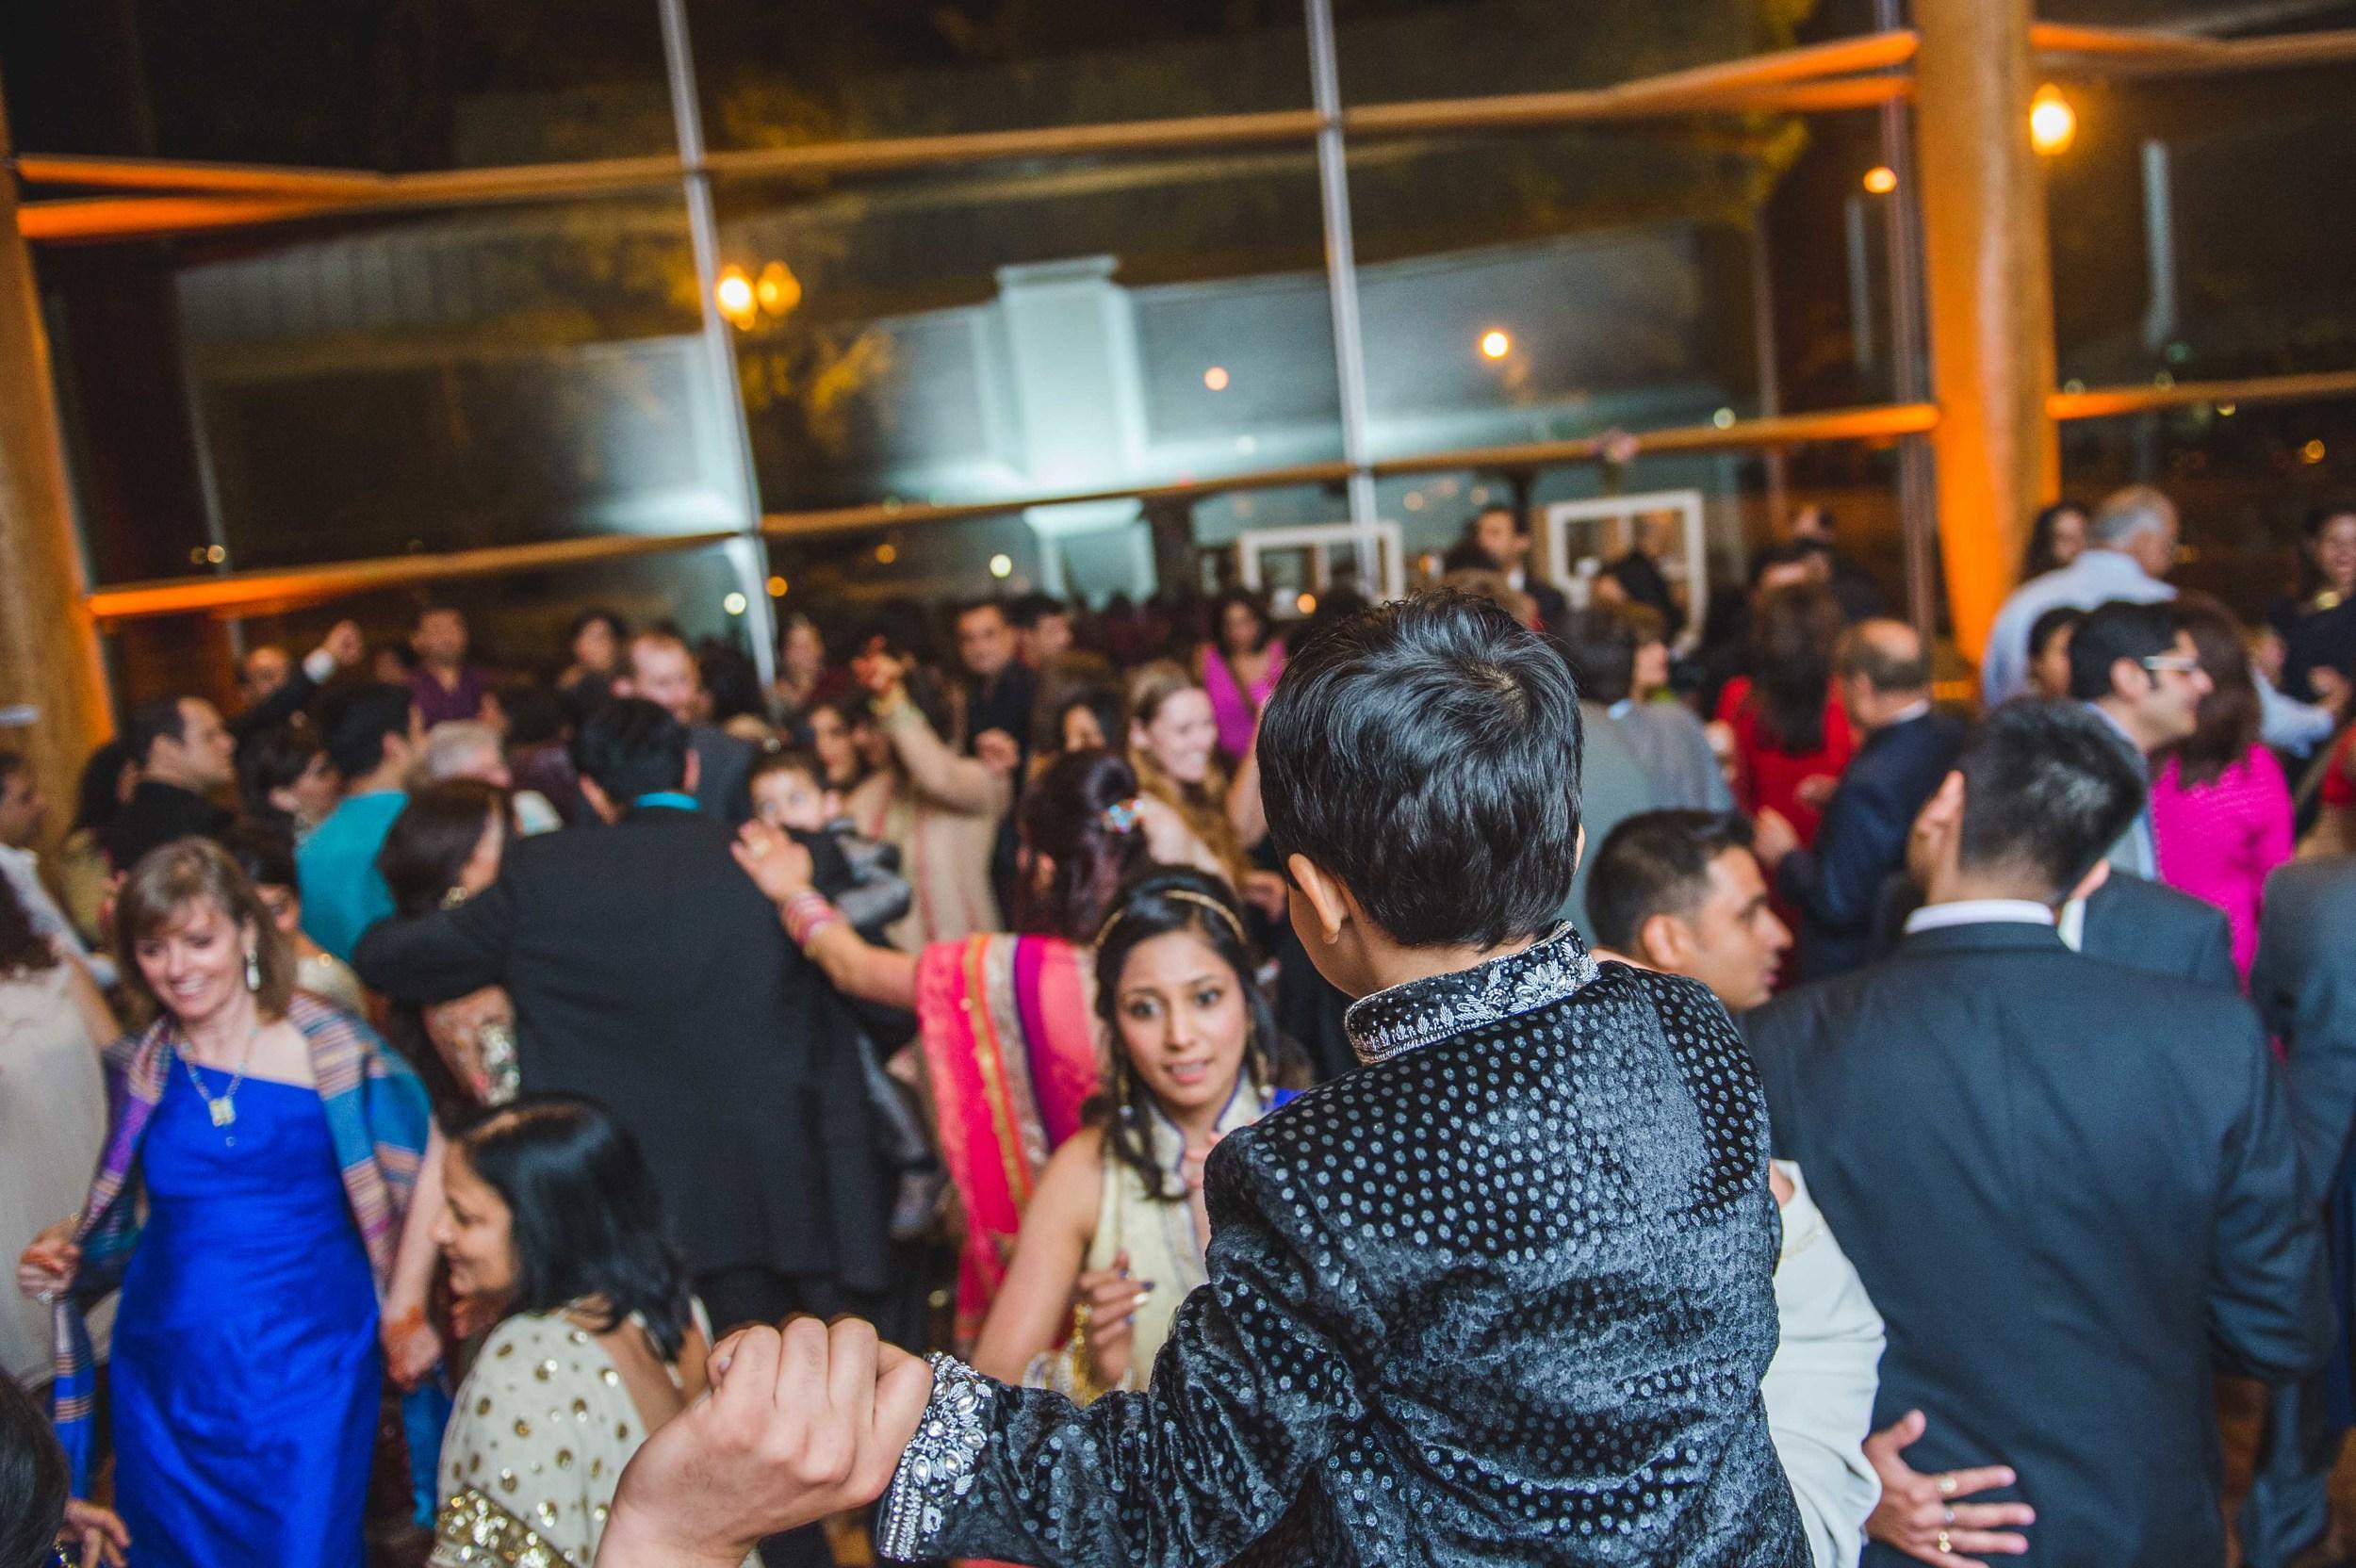 Indian Pre-wedding  at Arena Stage Washington DC by Mantas Kubilinskas-29.jpg